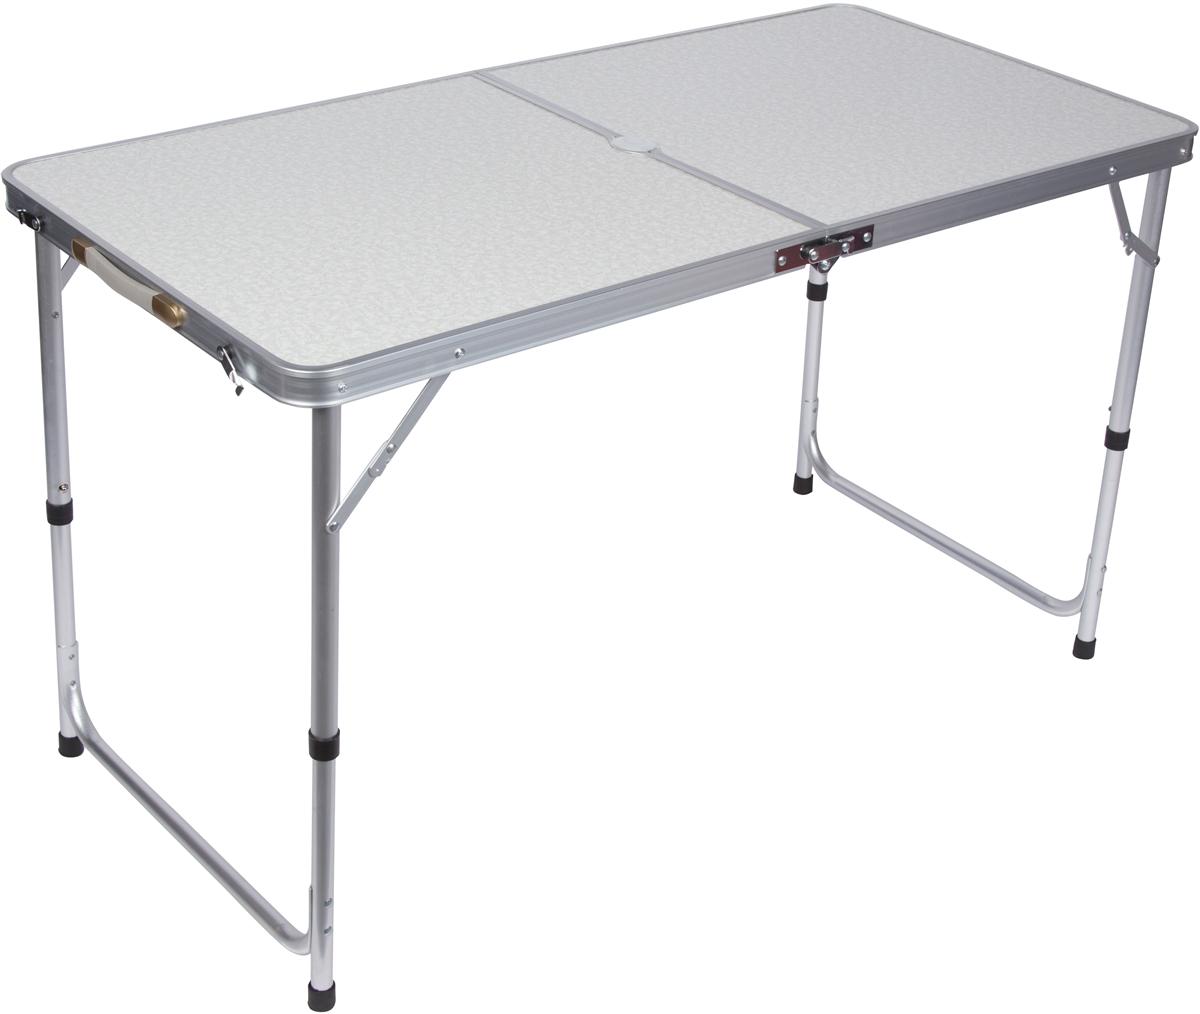 Lightweight Adjustable Portable Folding Aluminum Camp